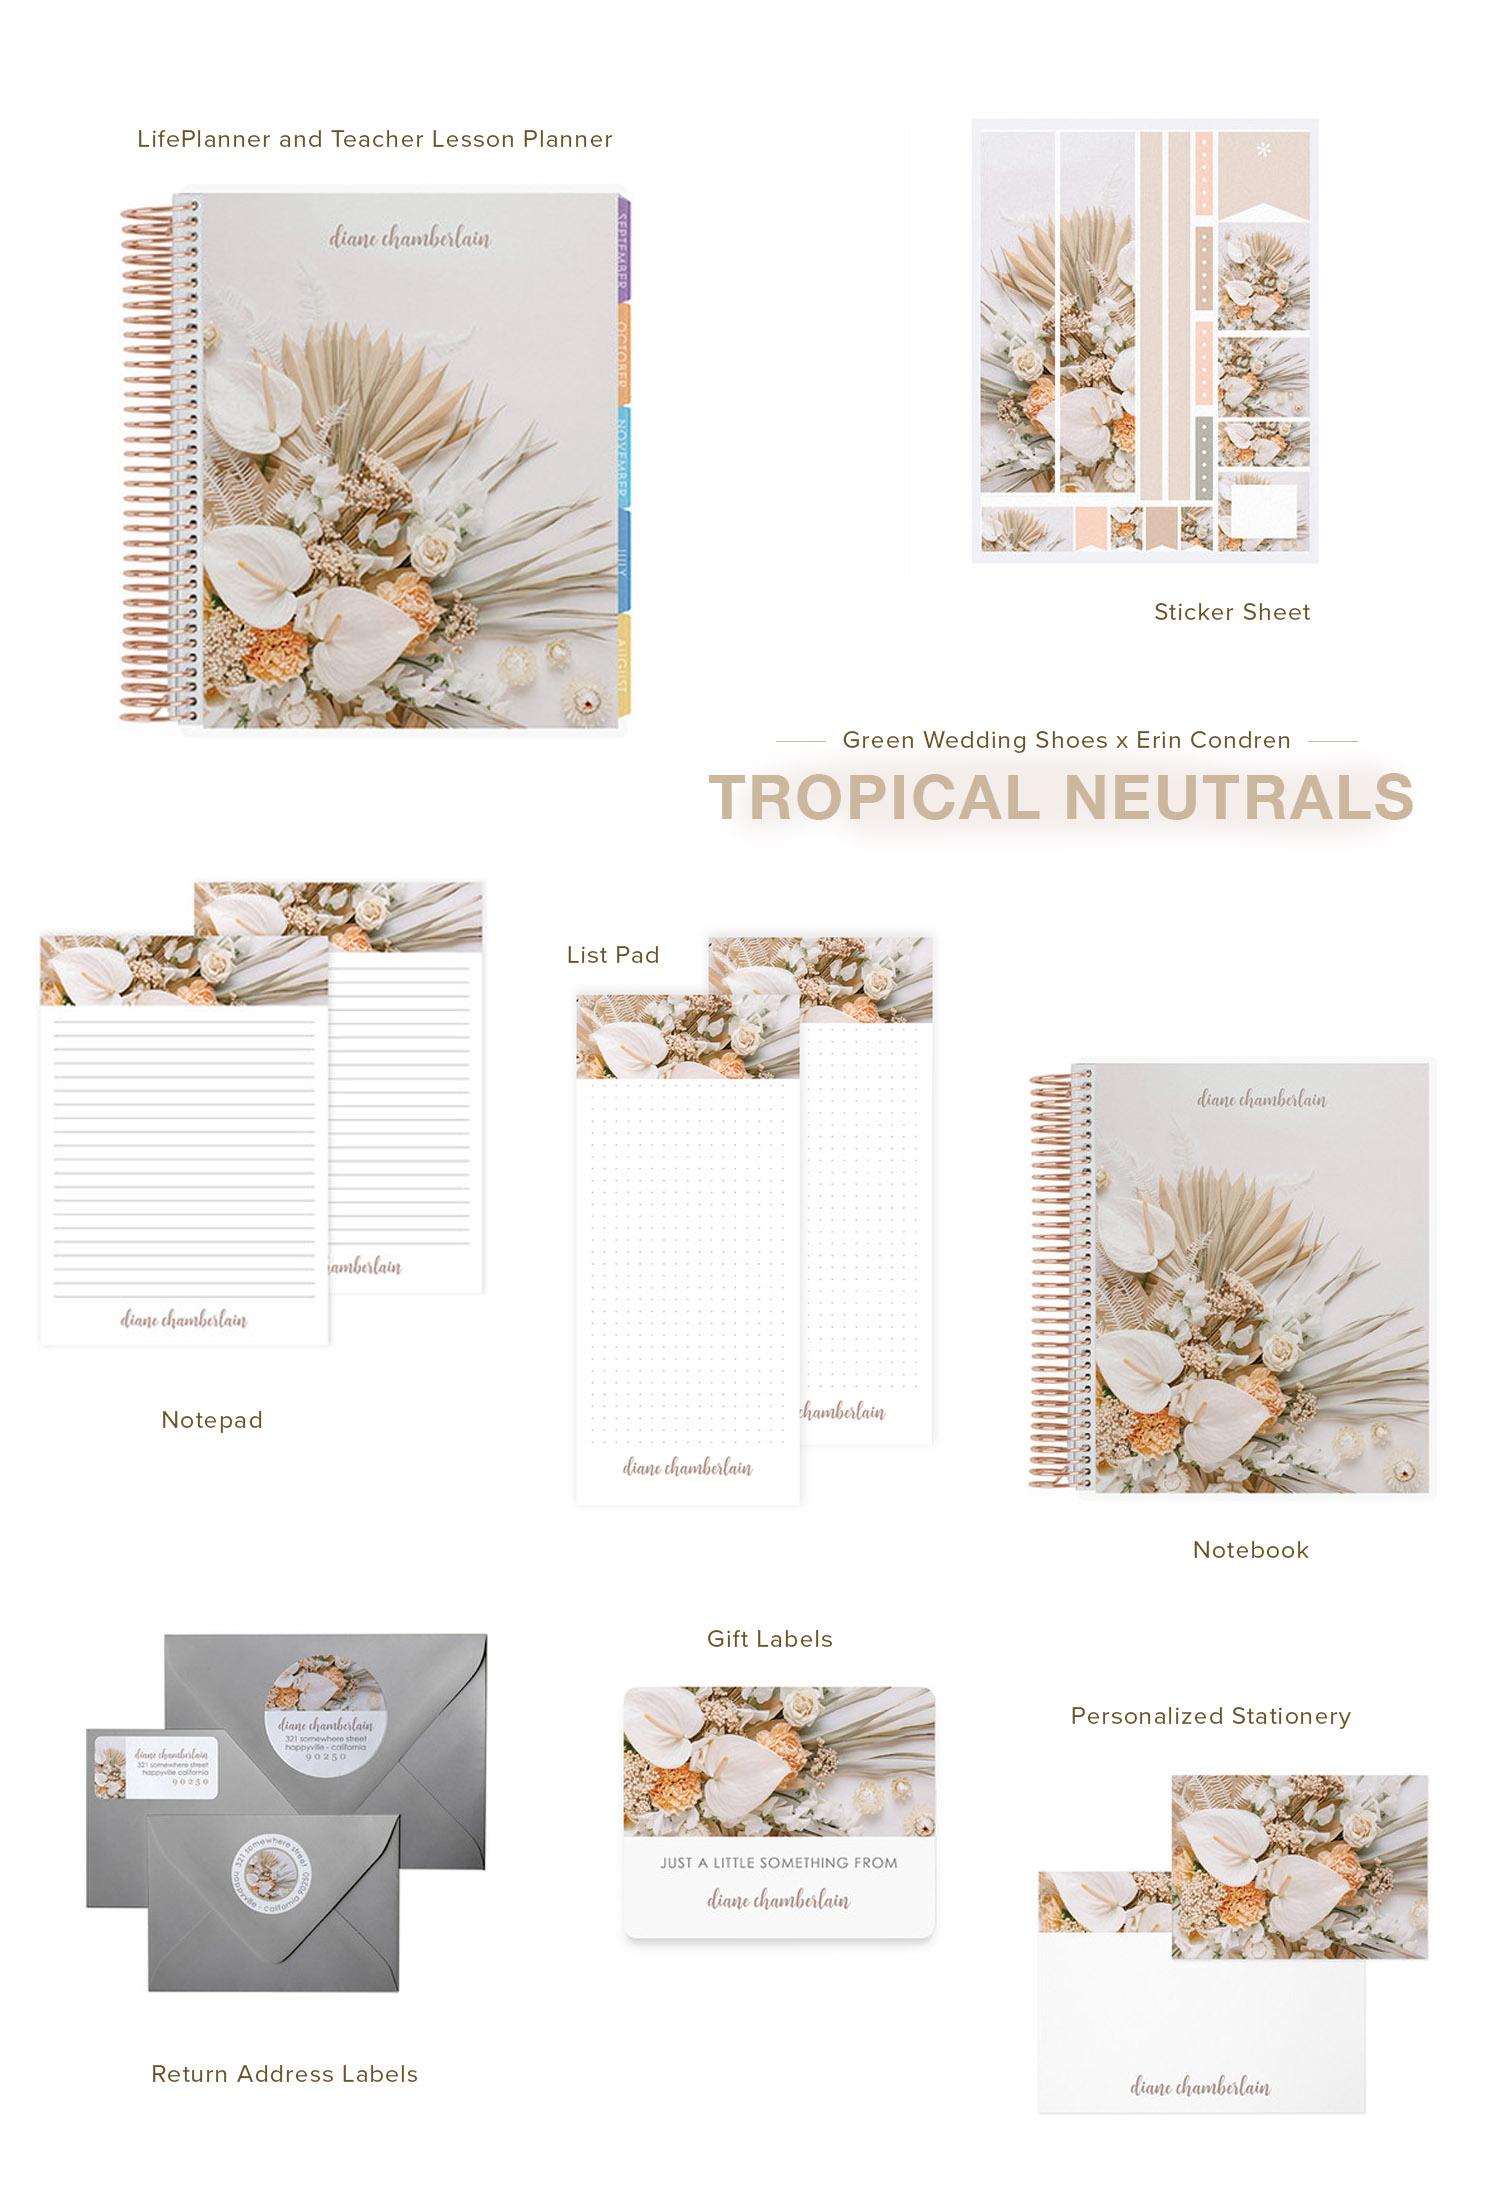 Tropical Neutrals LifePlanner